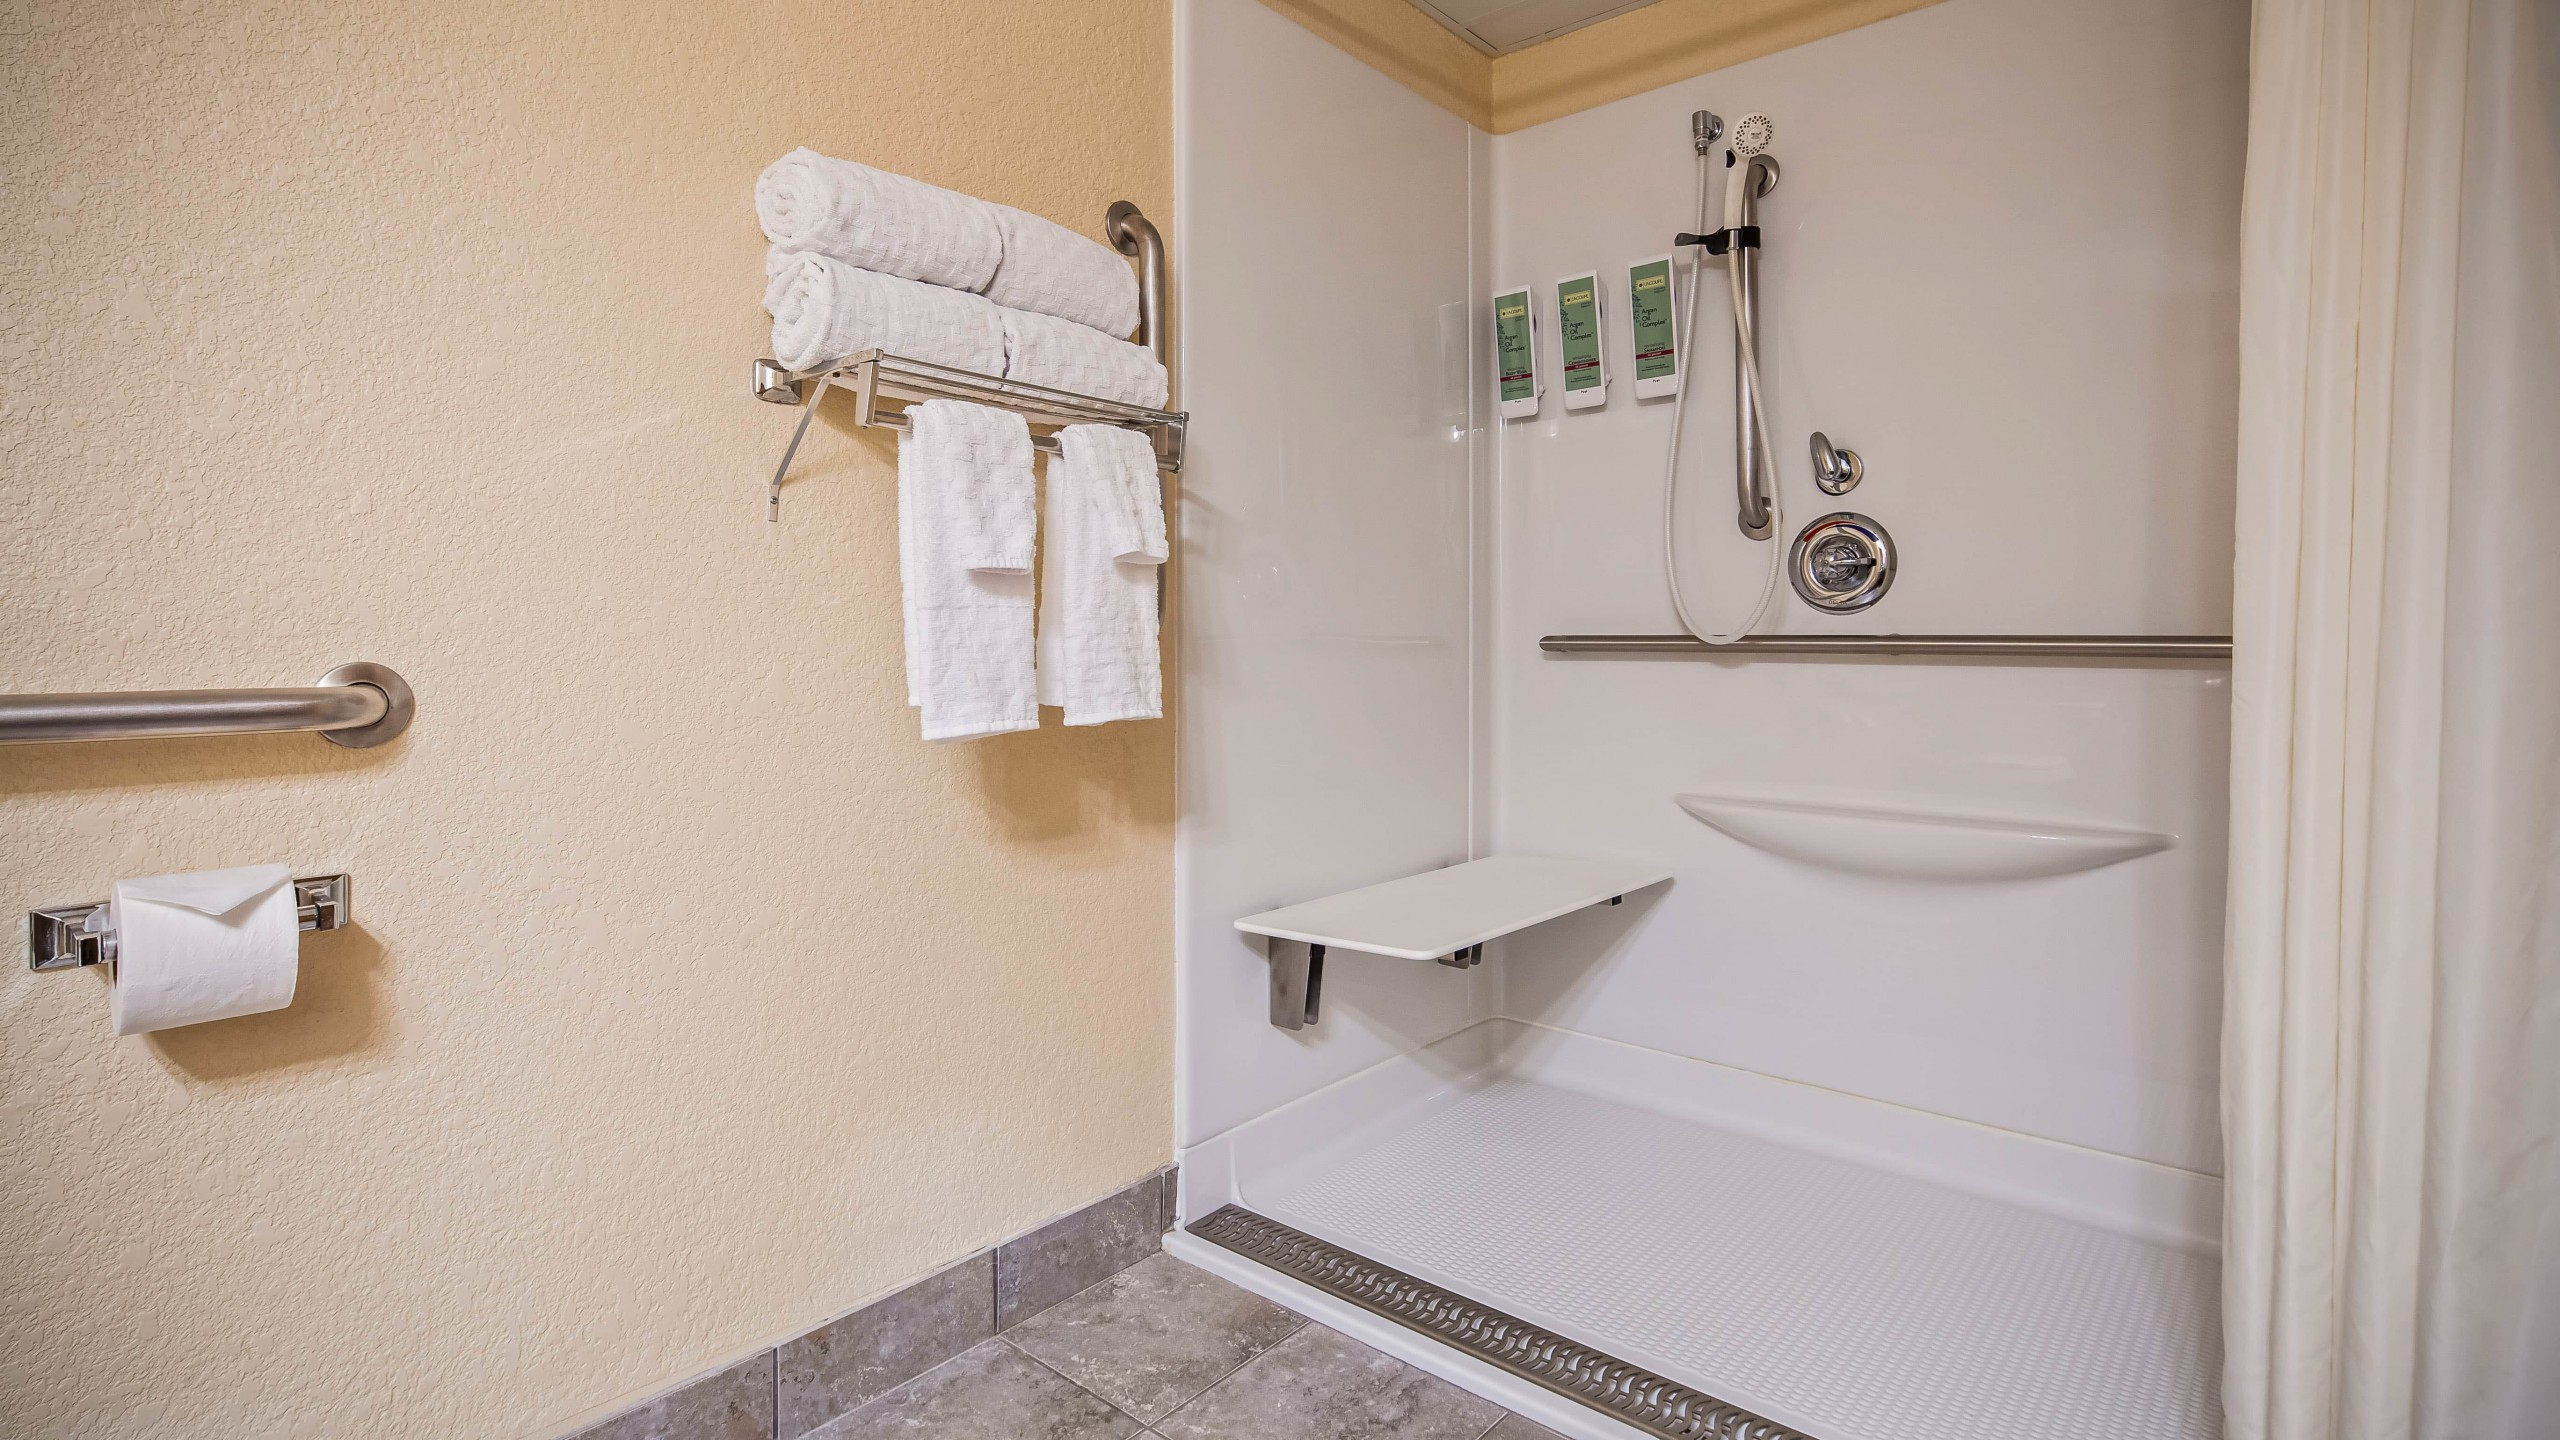 Best Western Center Pointe Inn Handicap Kings bathroom